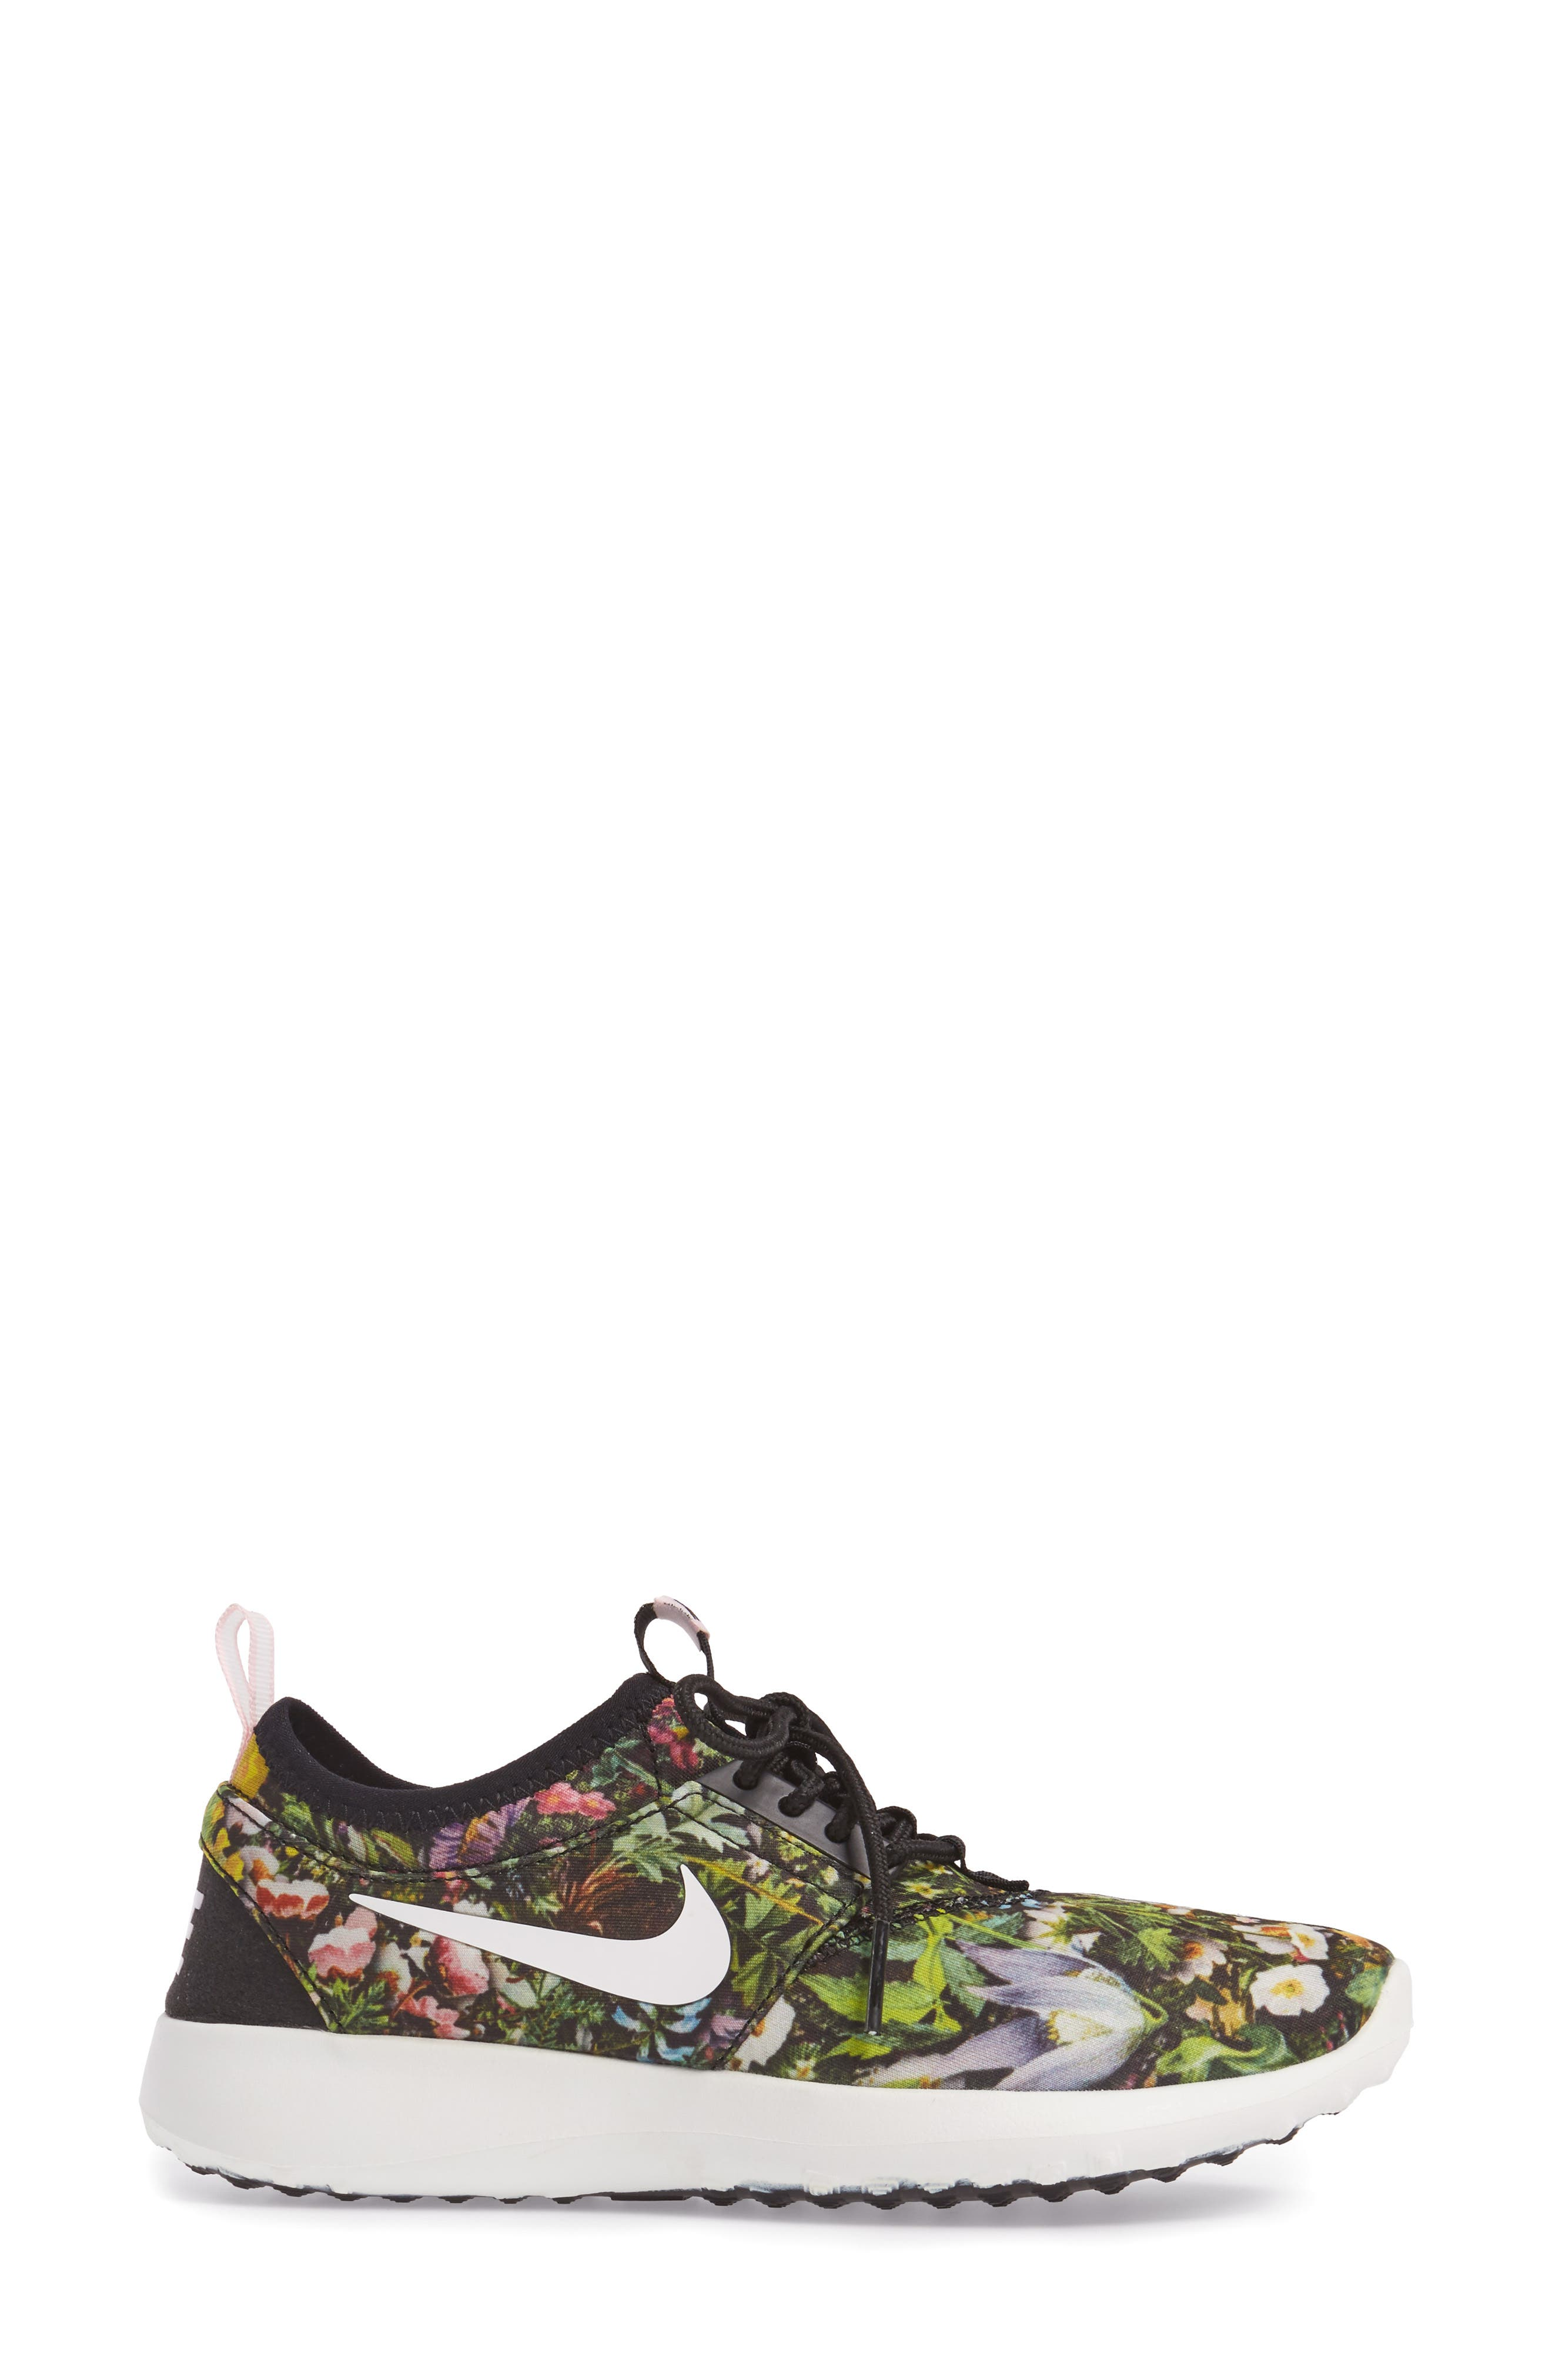 Juvenate SE Sneaker,                             Alternate thumbnail 26, color,